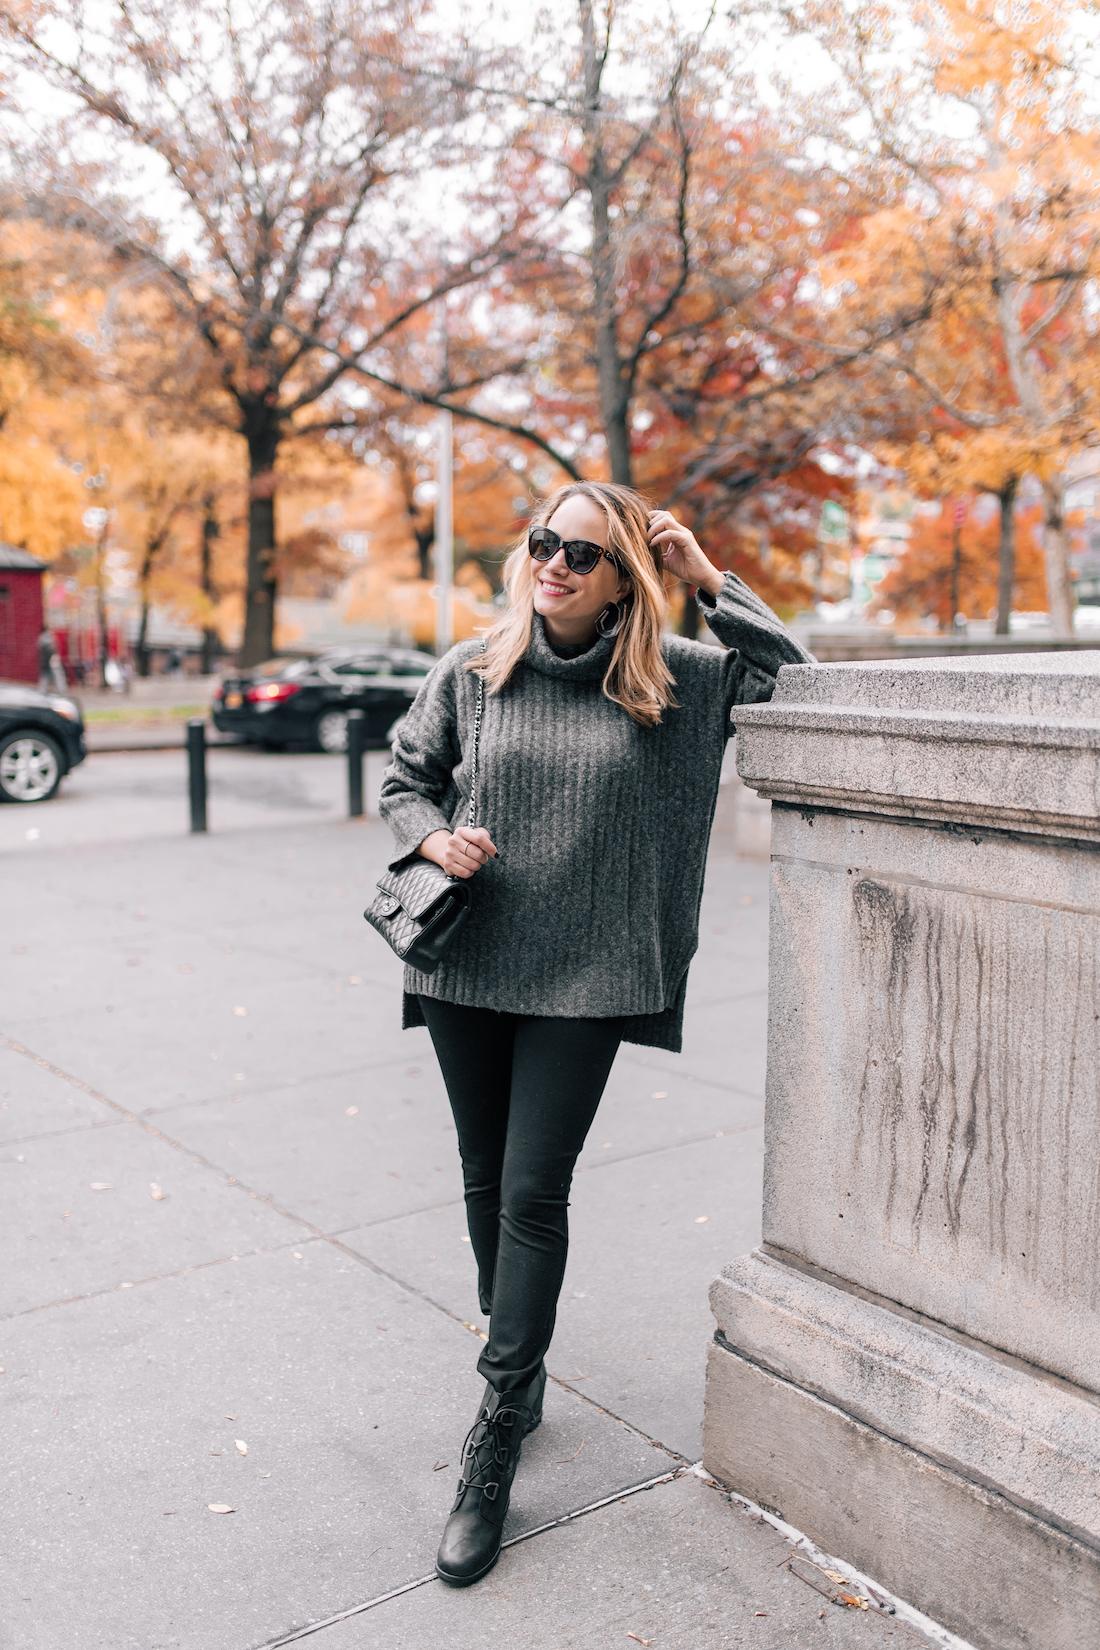 Outfit Details:French Connection Turtleneck // NYDJ Leggings // Polaroid Sunglasses // Sorel Boots // Chanel Purse